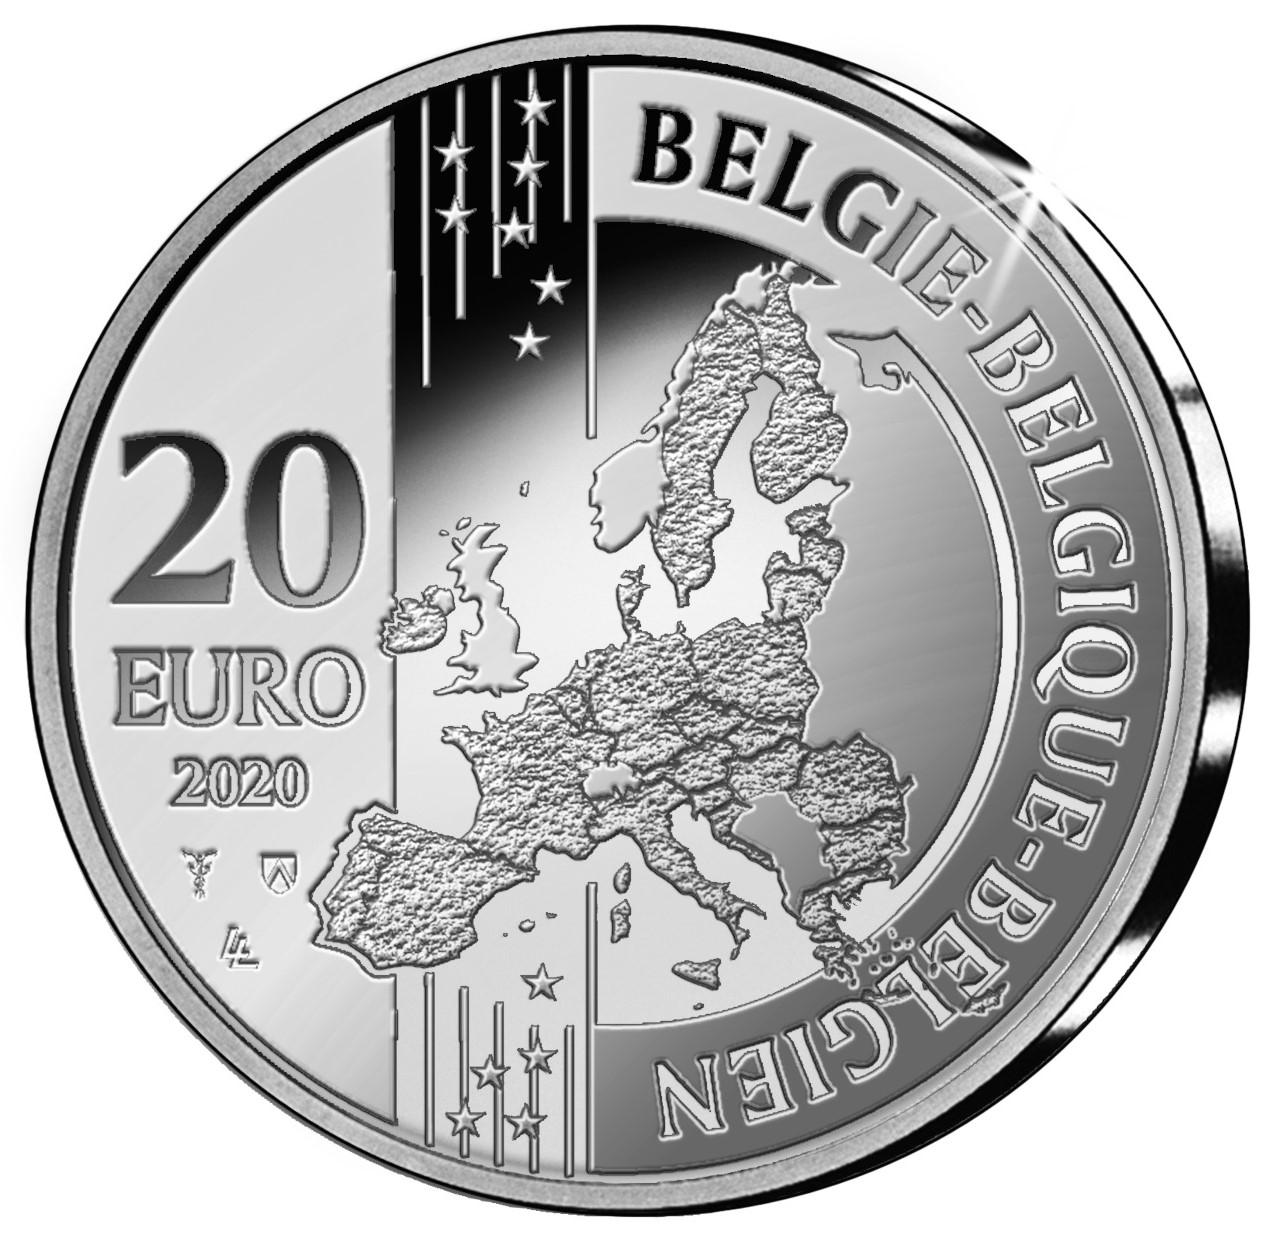 BE 20 Euro 2020 Staff of Mercury